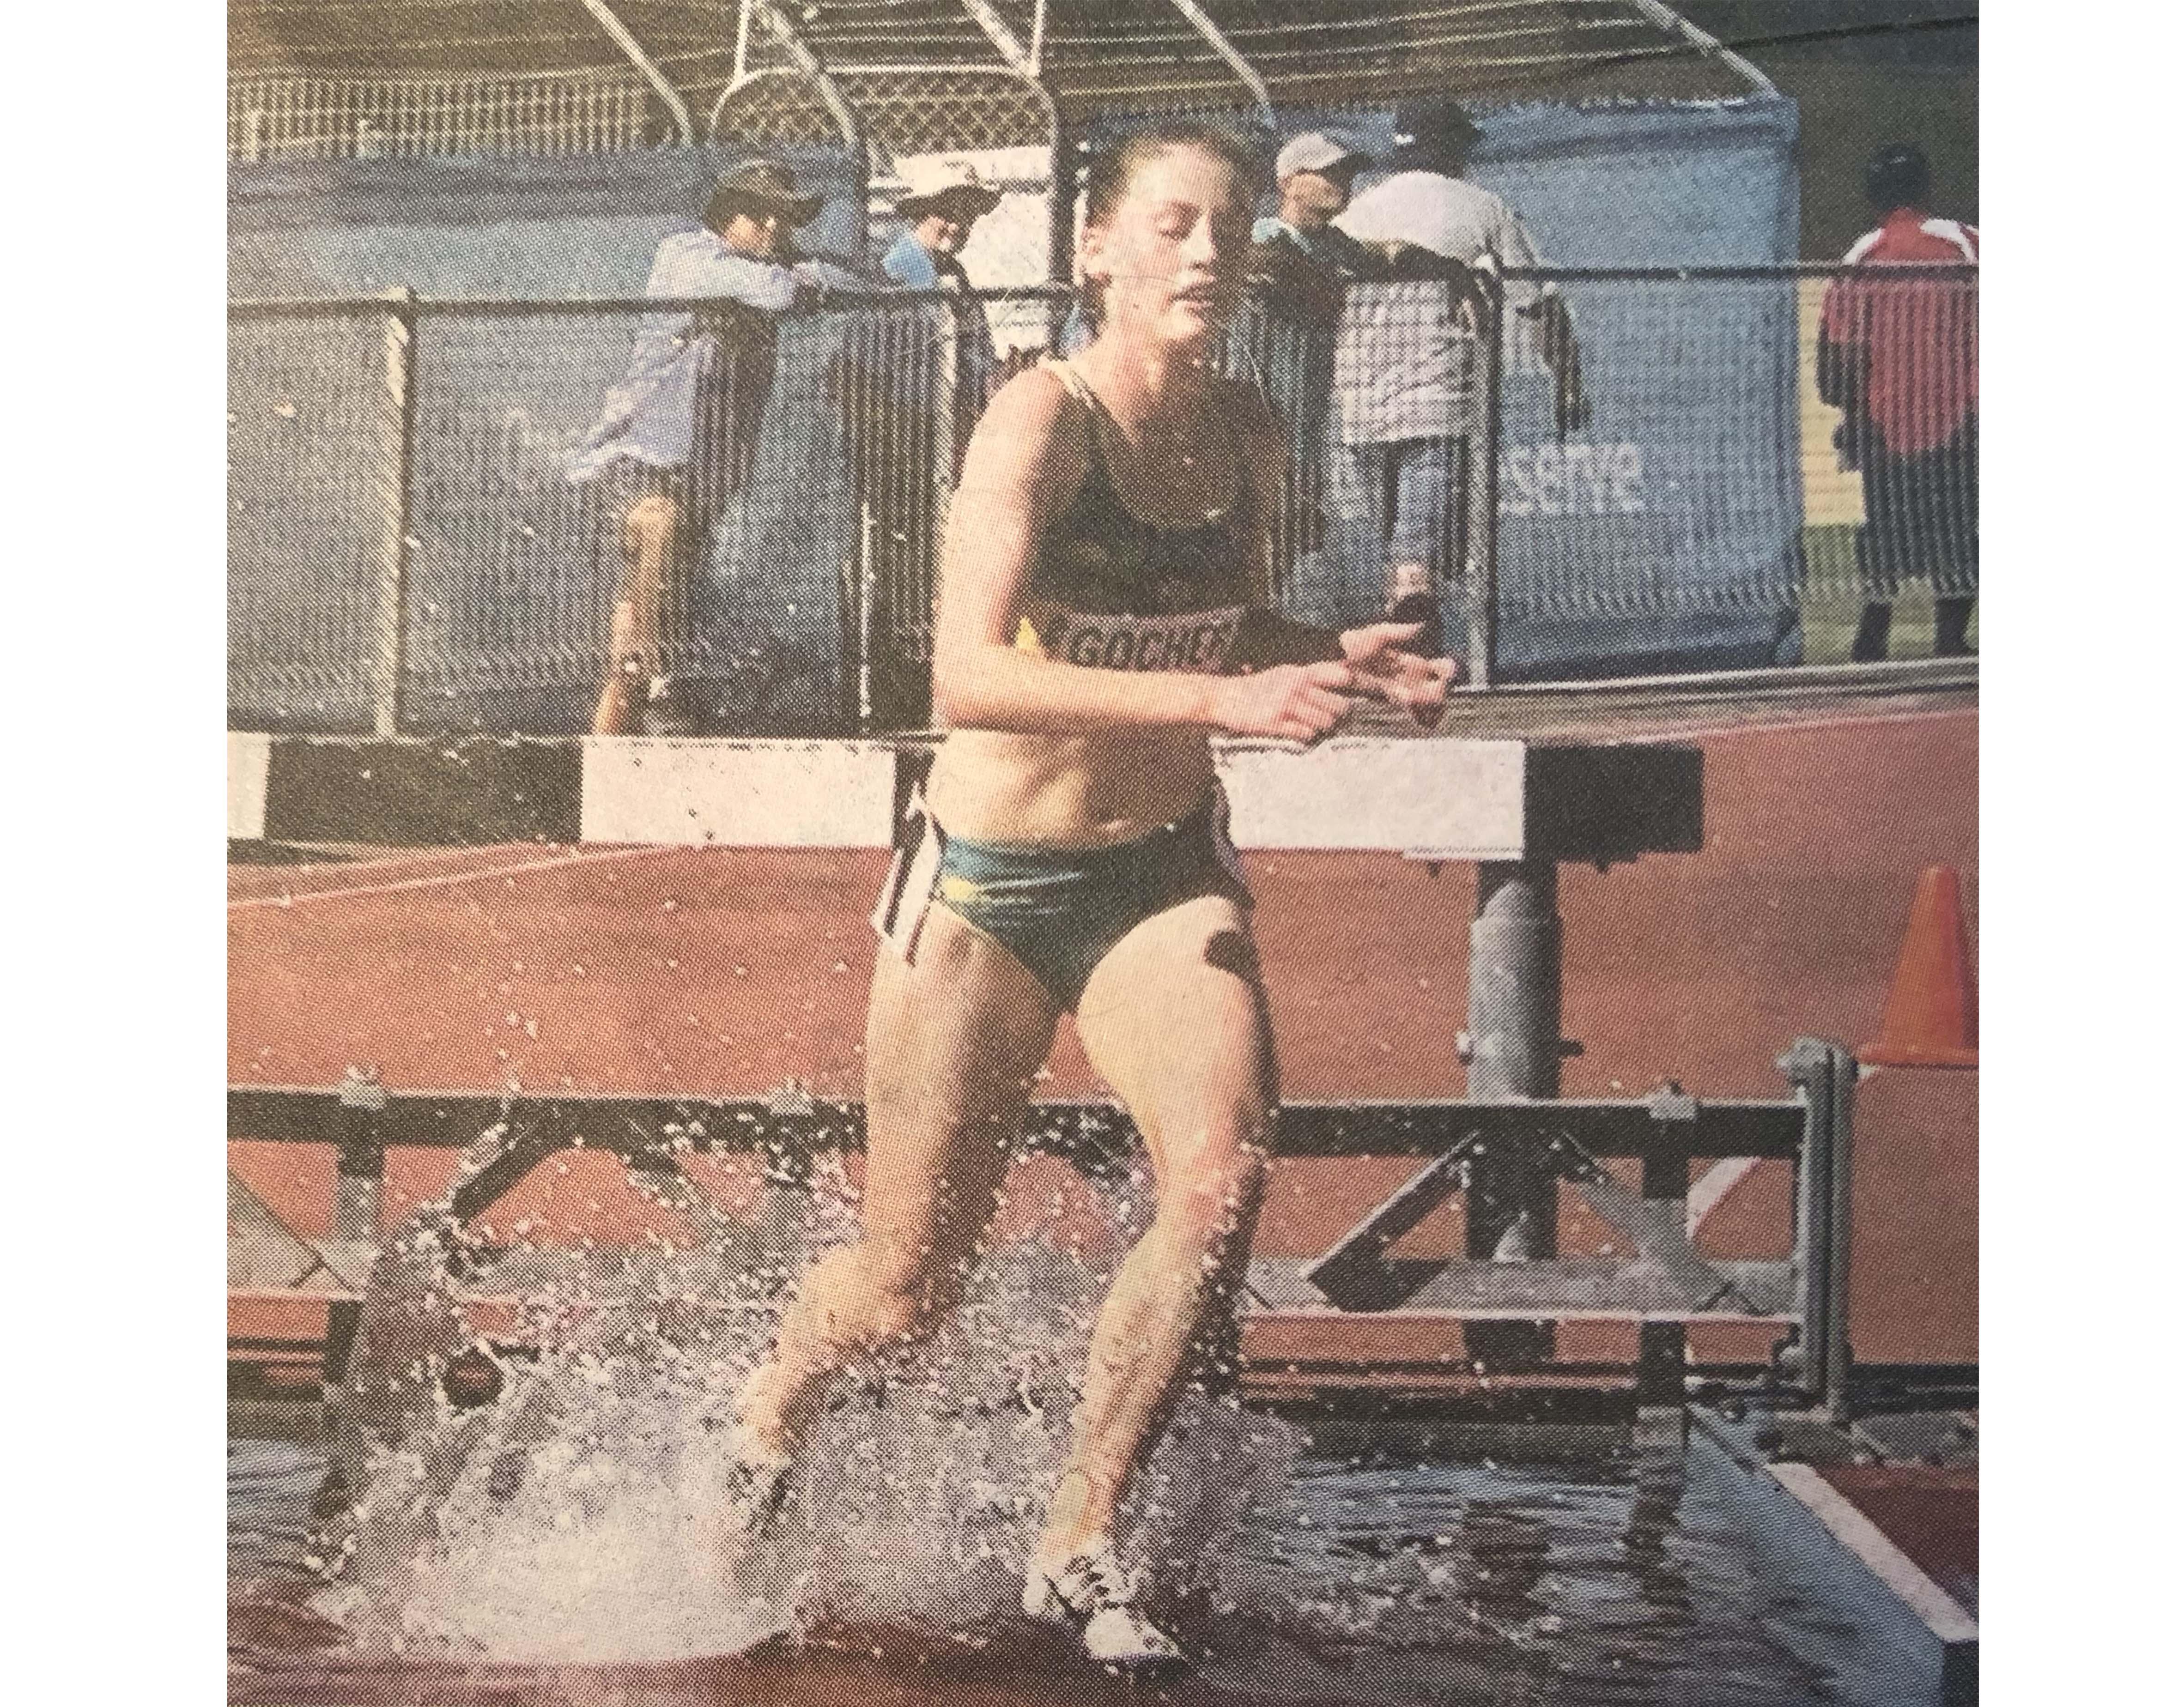 Sophie Gocher representing Australia in steeplechase at 2019 Oceania Championships copyright TWT 31 Jul 2019